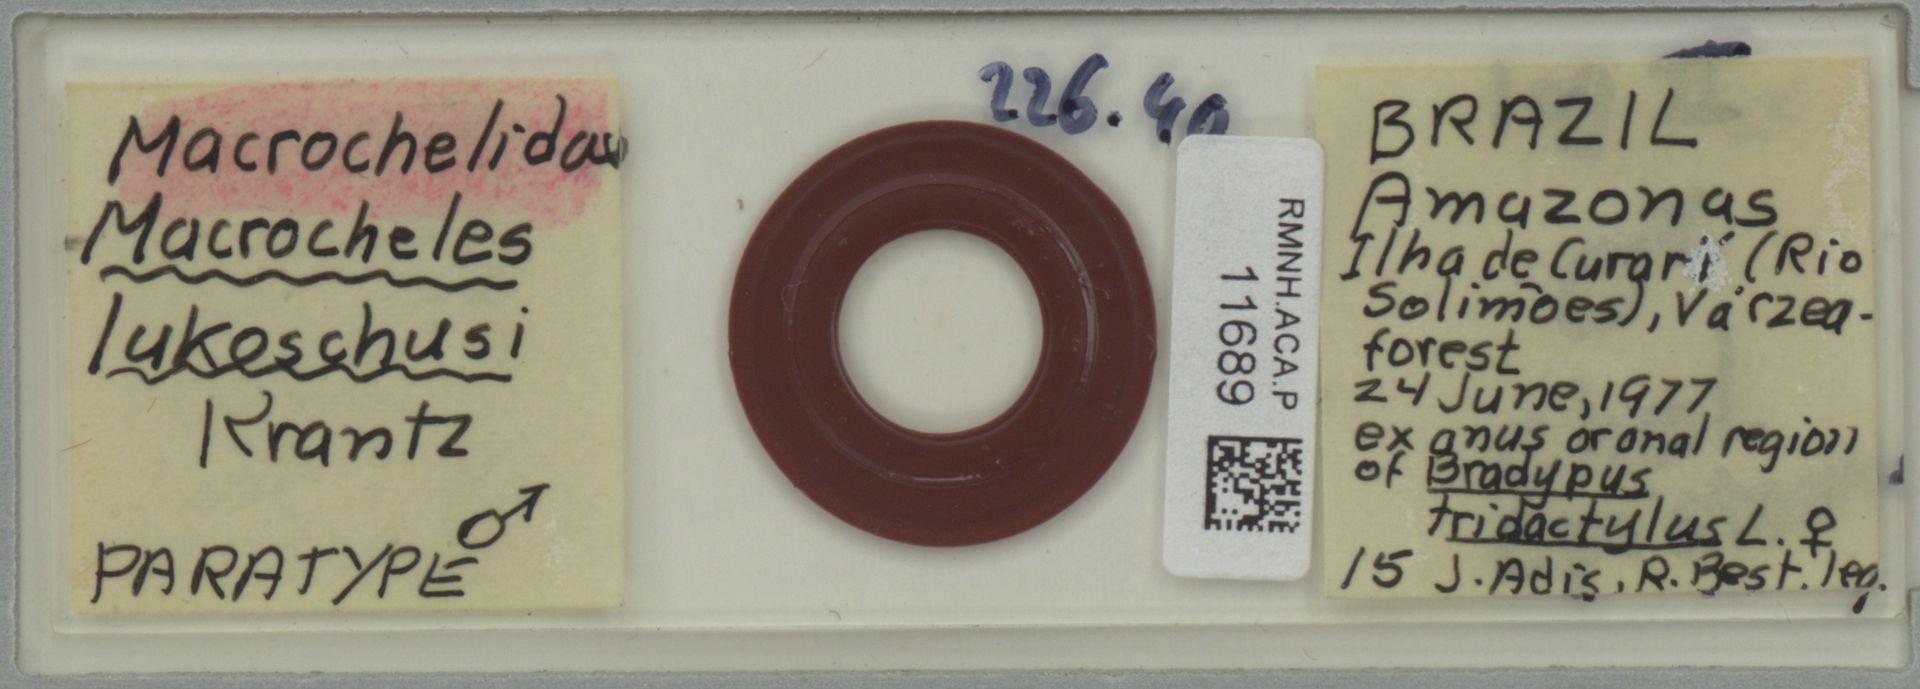 RMNH.ACA.P.11689 | Macrocheles lukoschusi Krantz